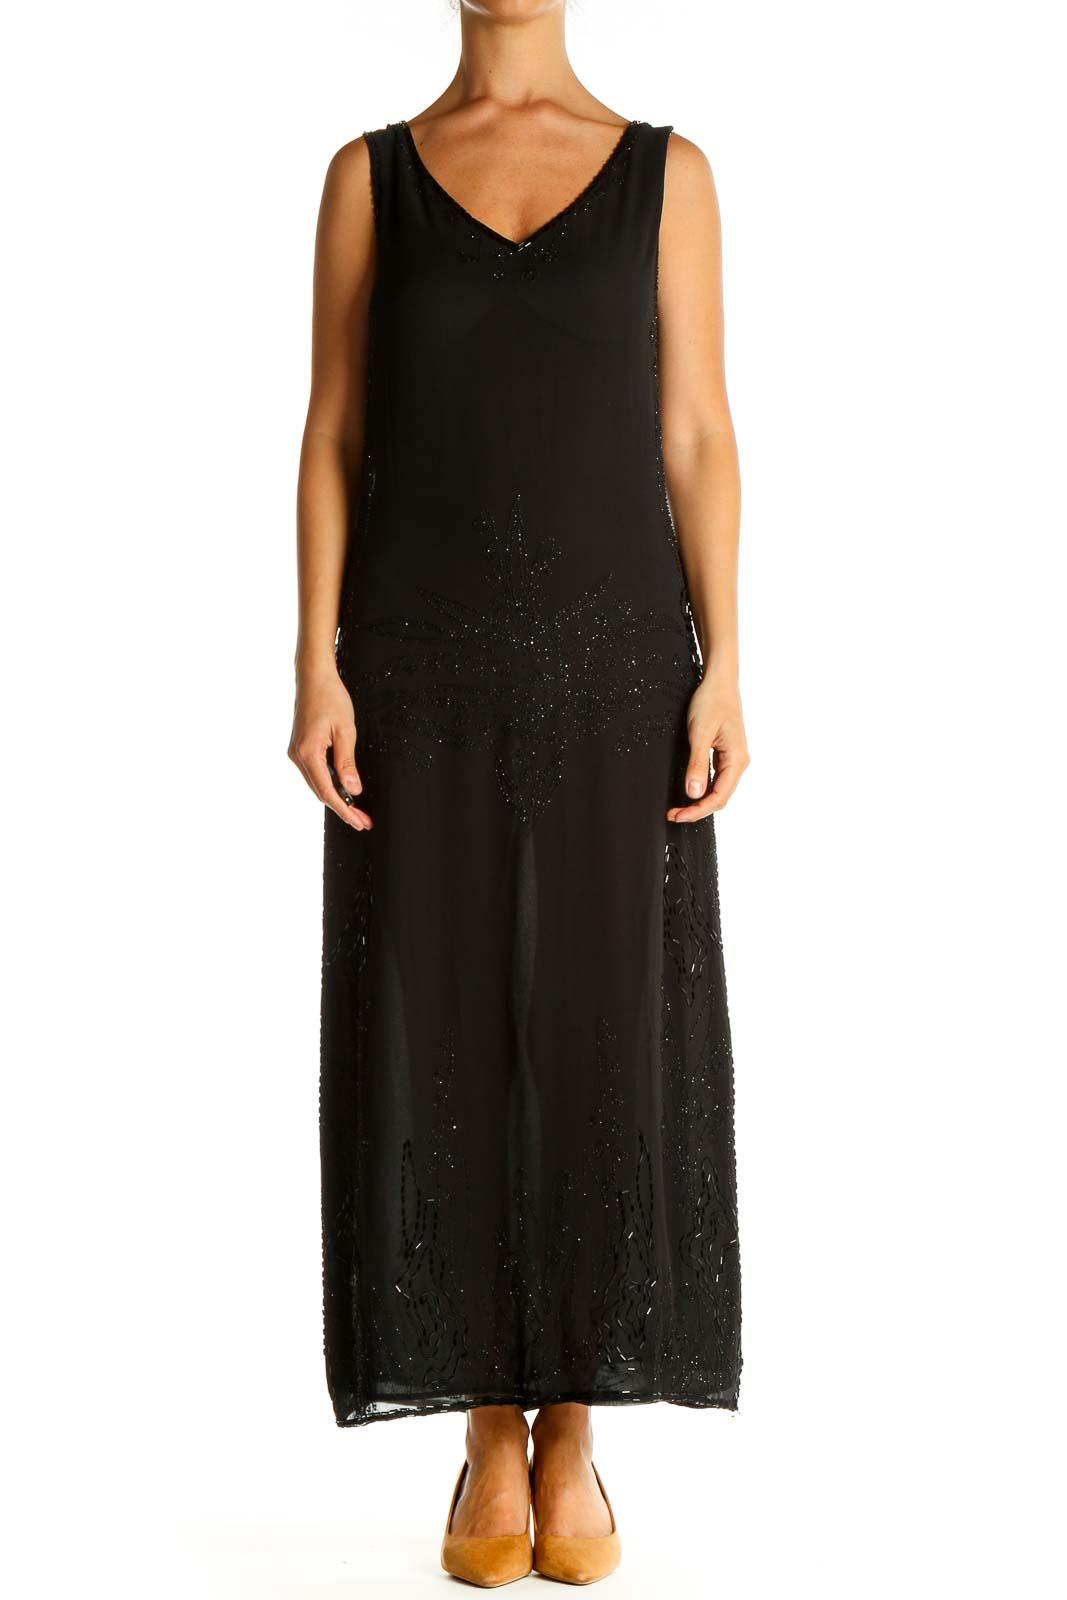 Black Sequin Column Dress Front